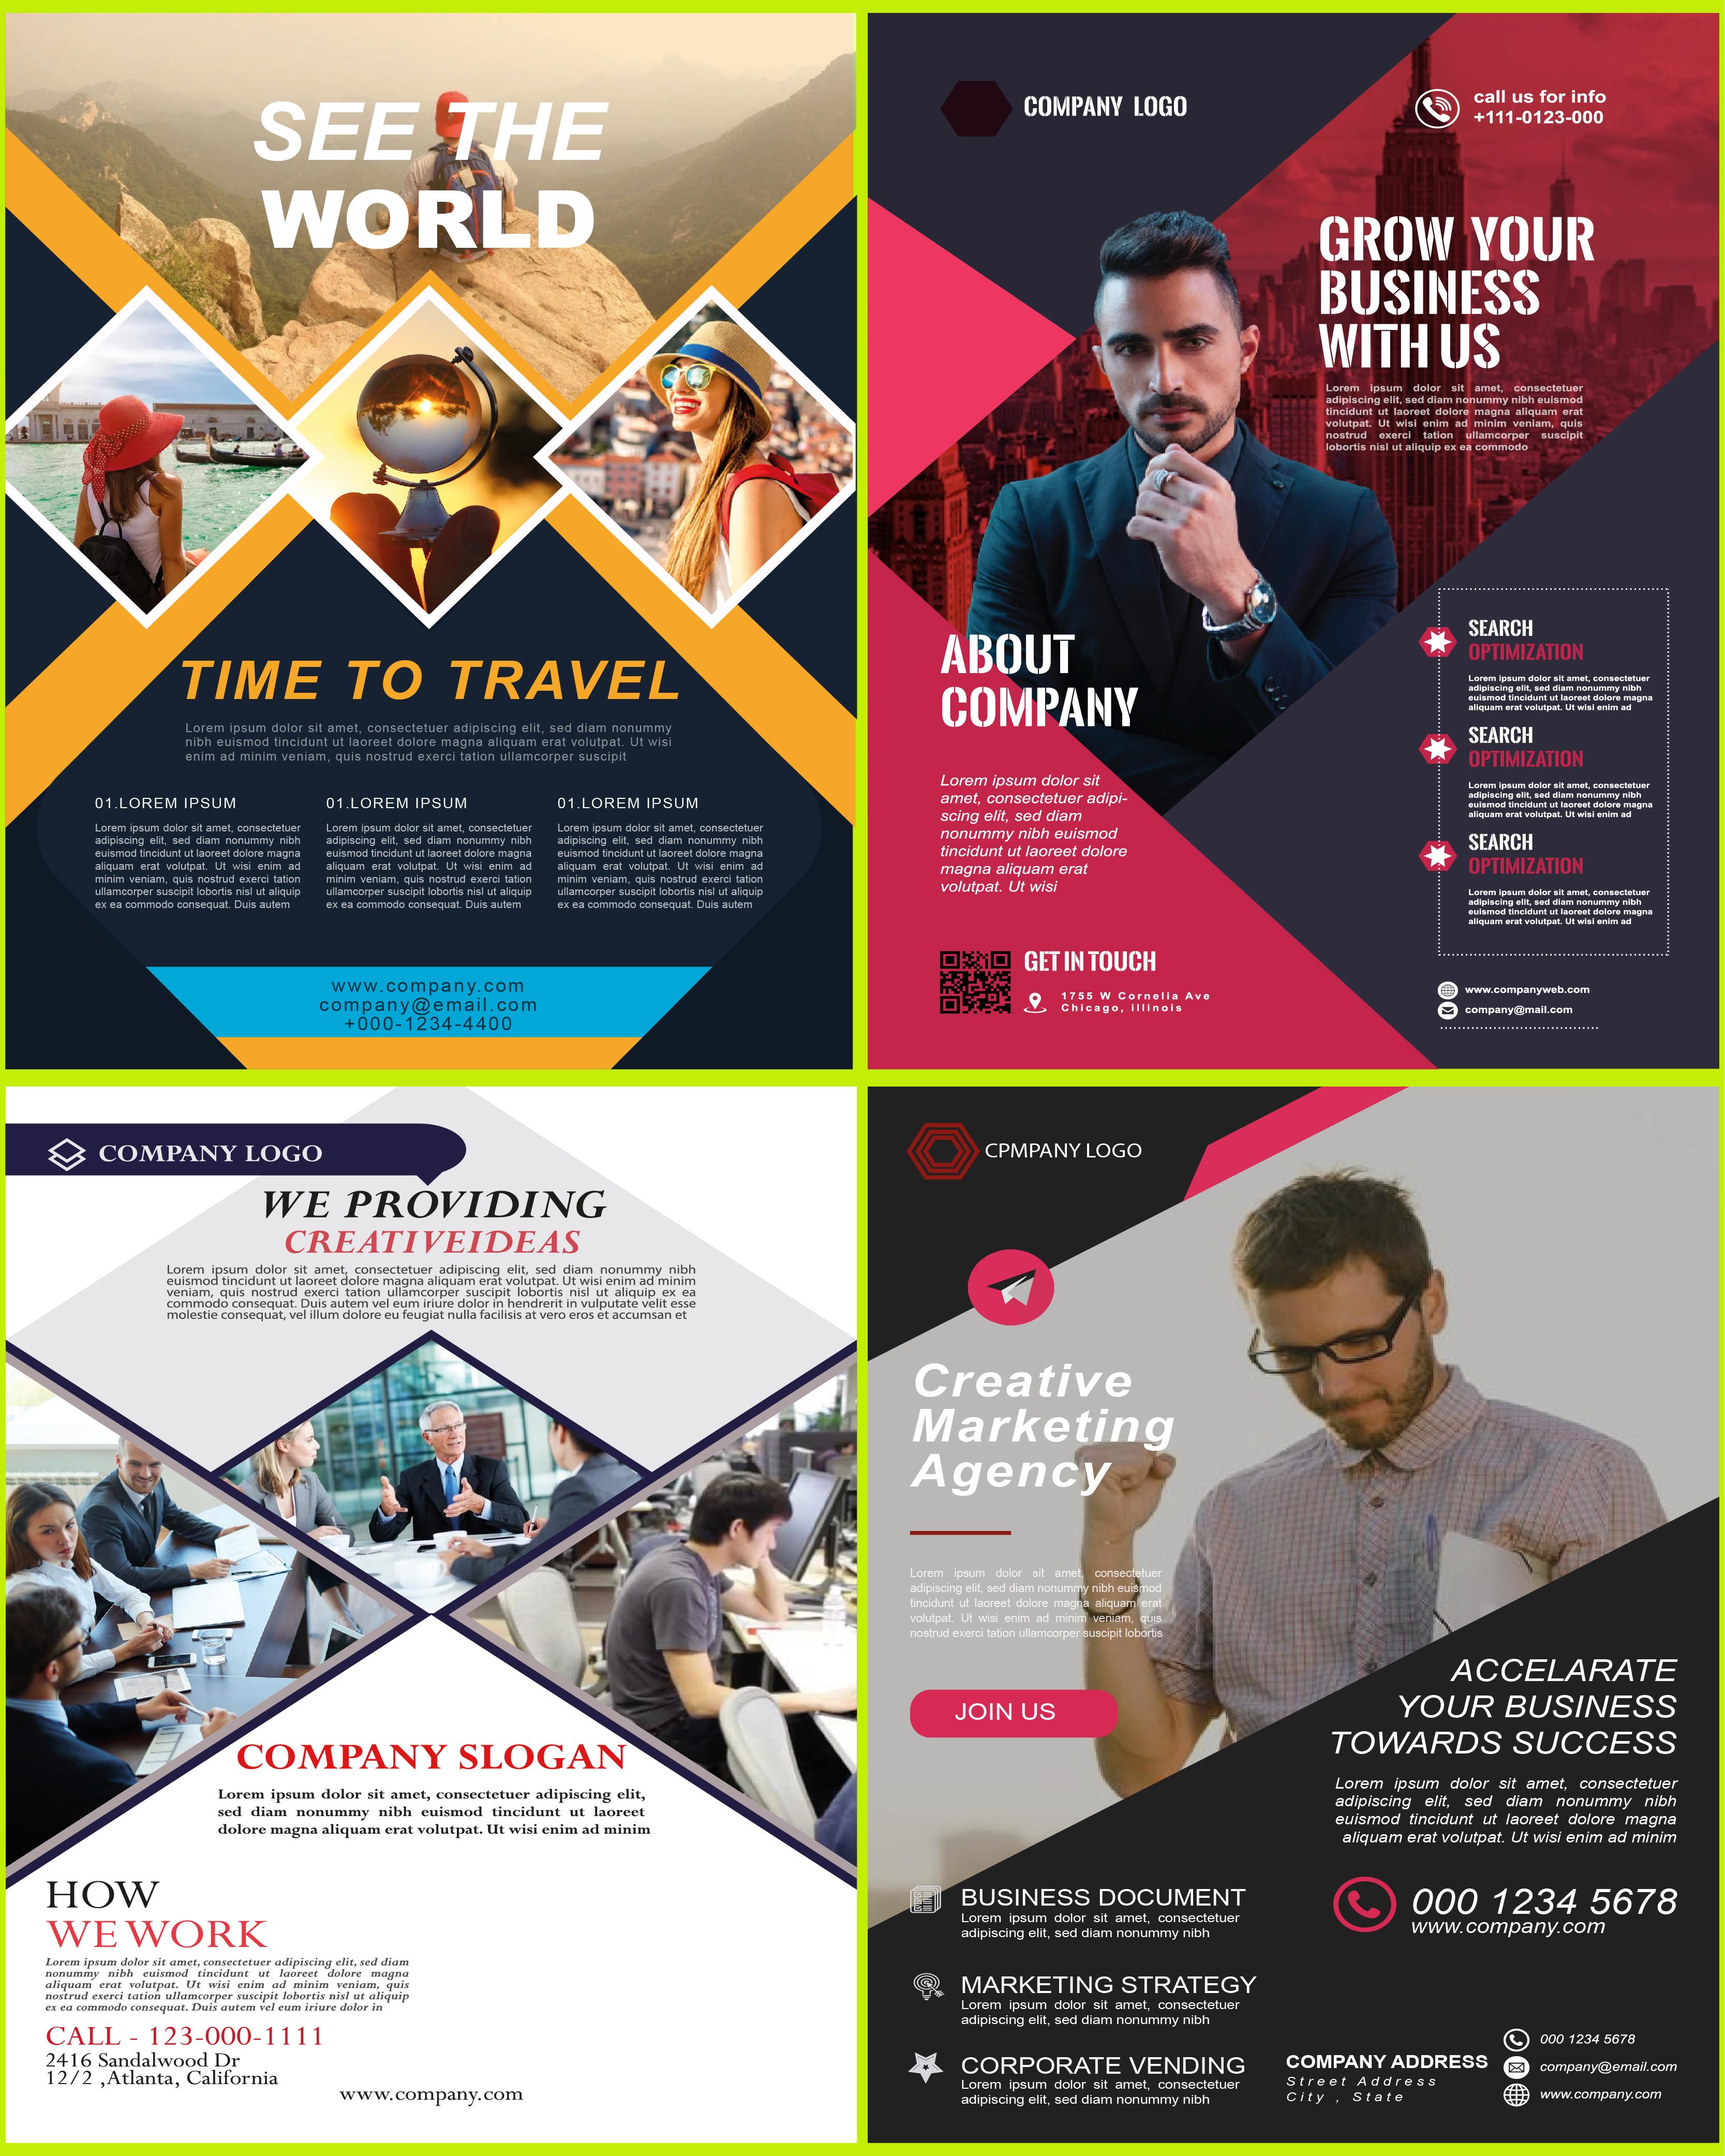 I will design professional brochure, flyer, creative design service